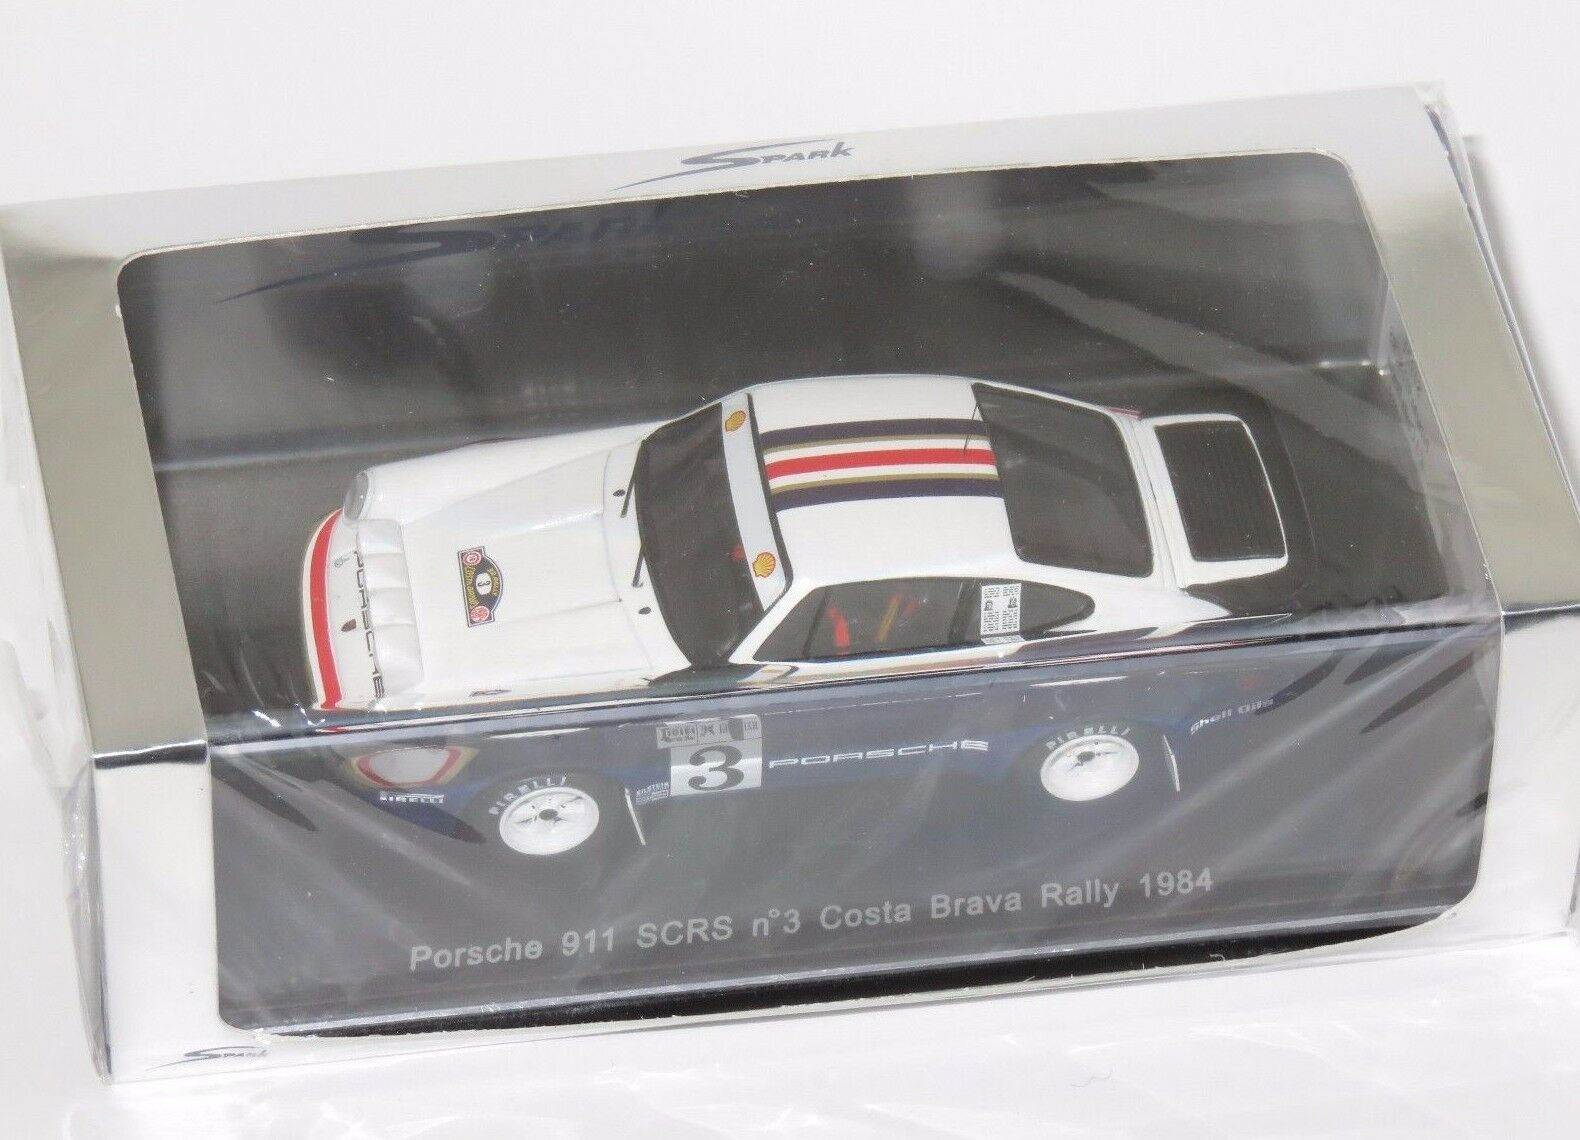 1/43 PORSCHE 911 SCR RALLY COSTA BRAVA 1984  3 H. Toivonen/Piironen J.